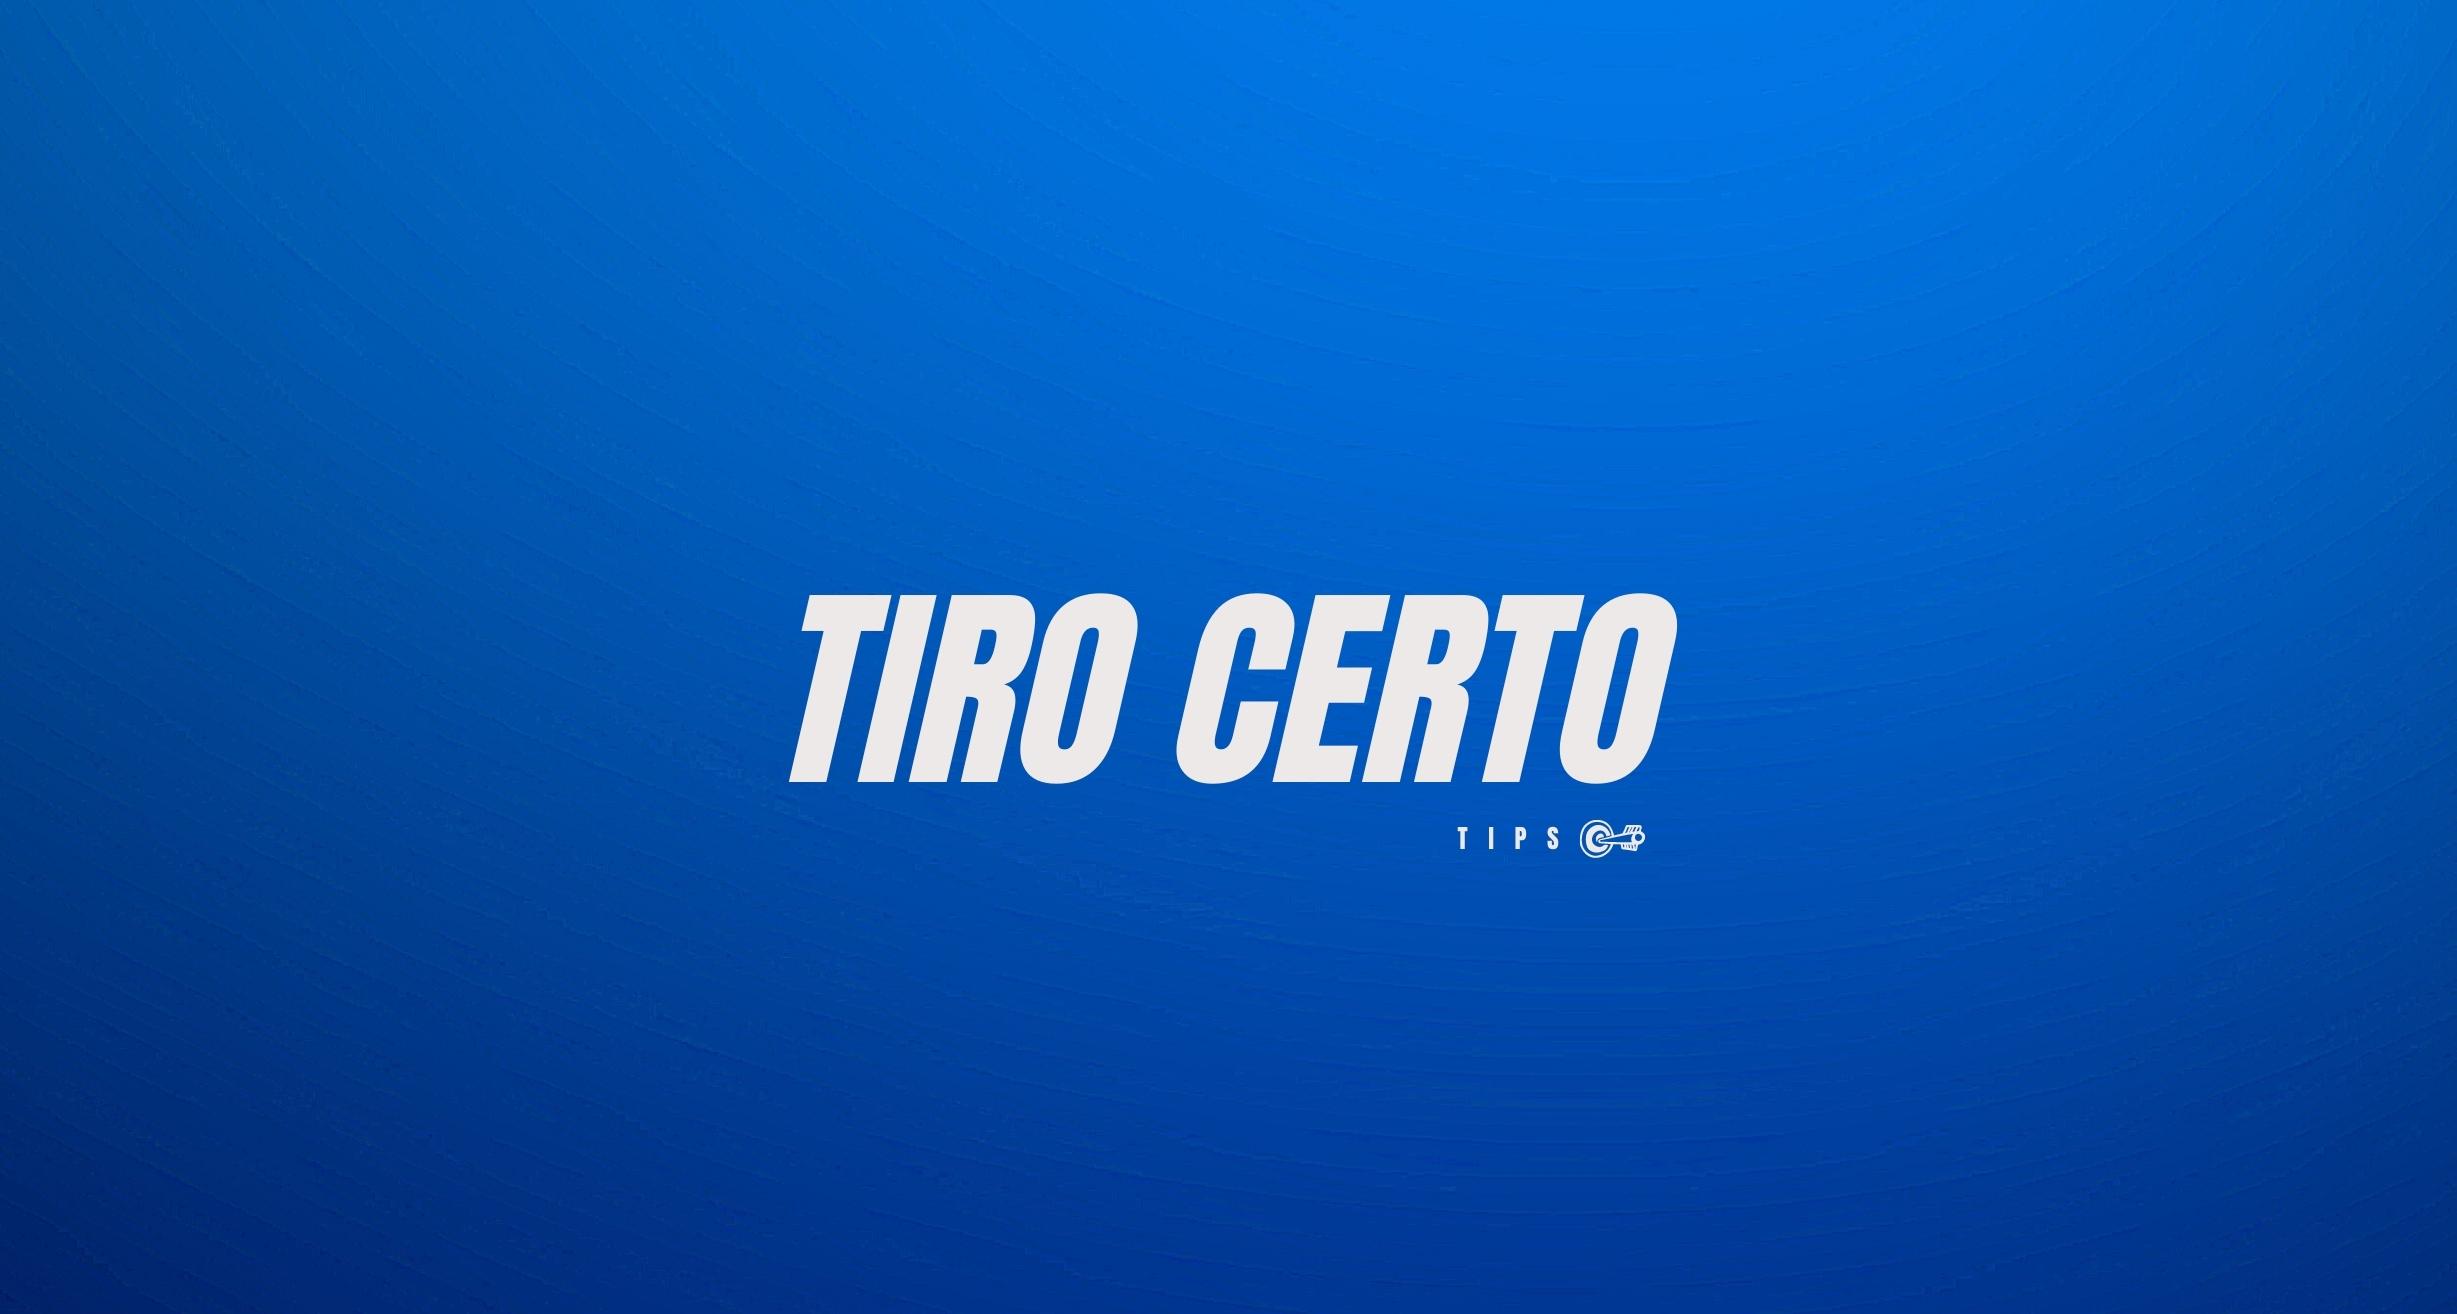 TIRO CERTO (FREE) 🤑